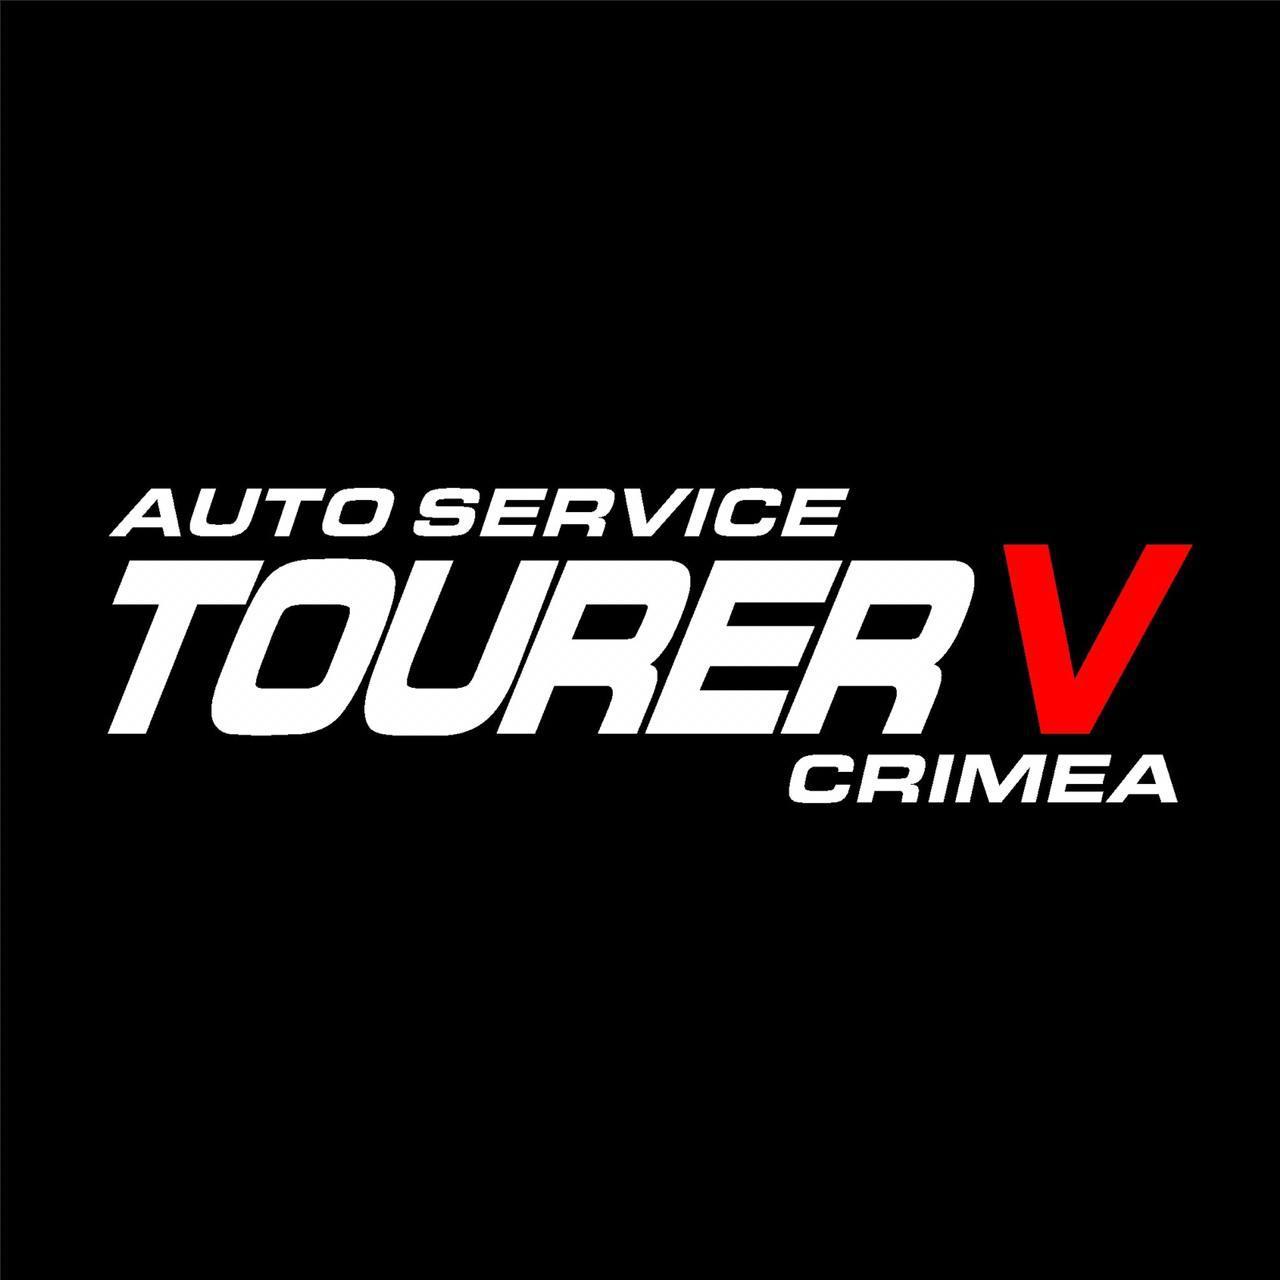 логотип компании TourerV service